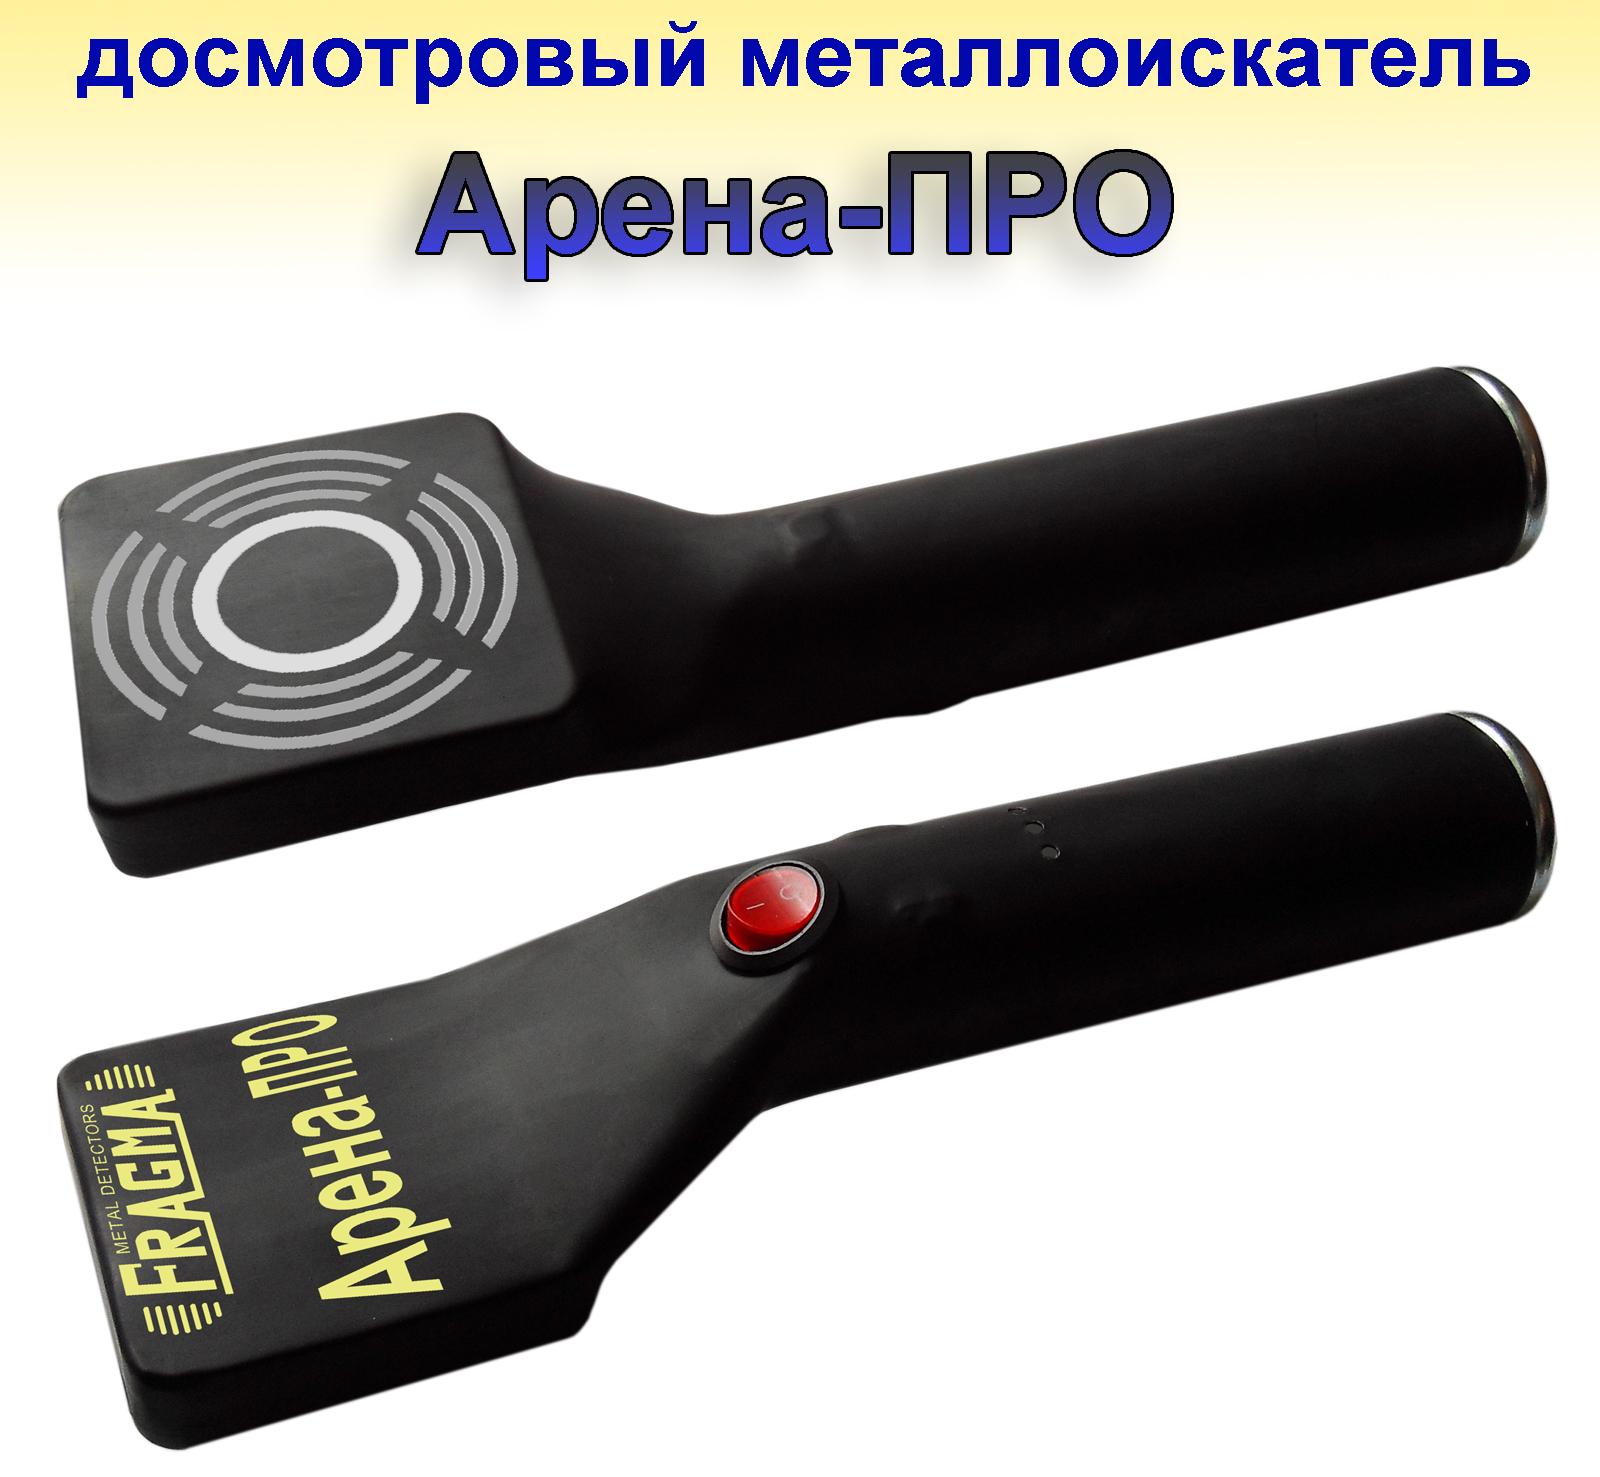 Ручной металлодетектор Арена-ПРО